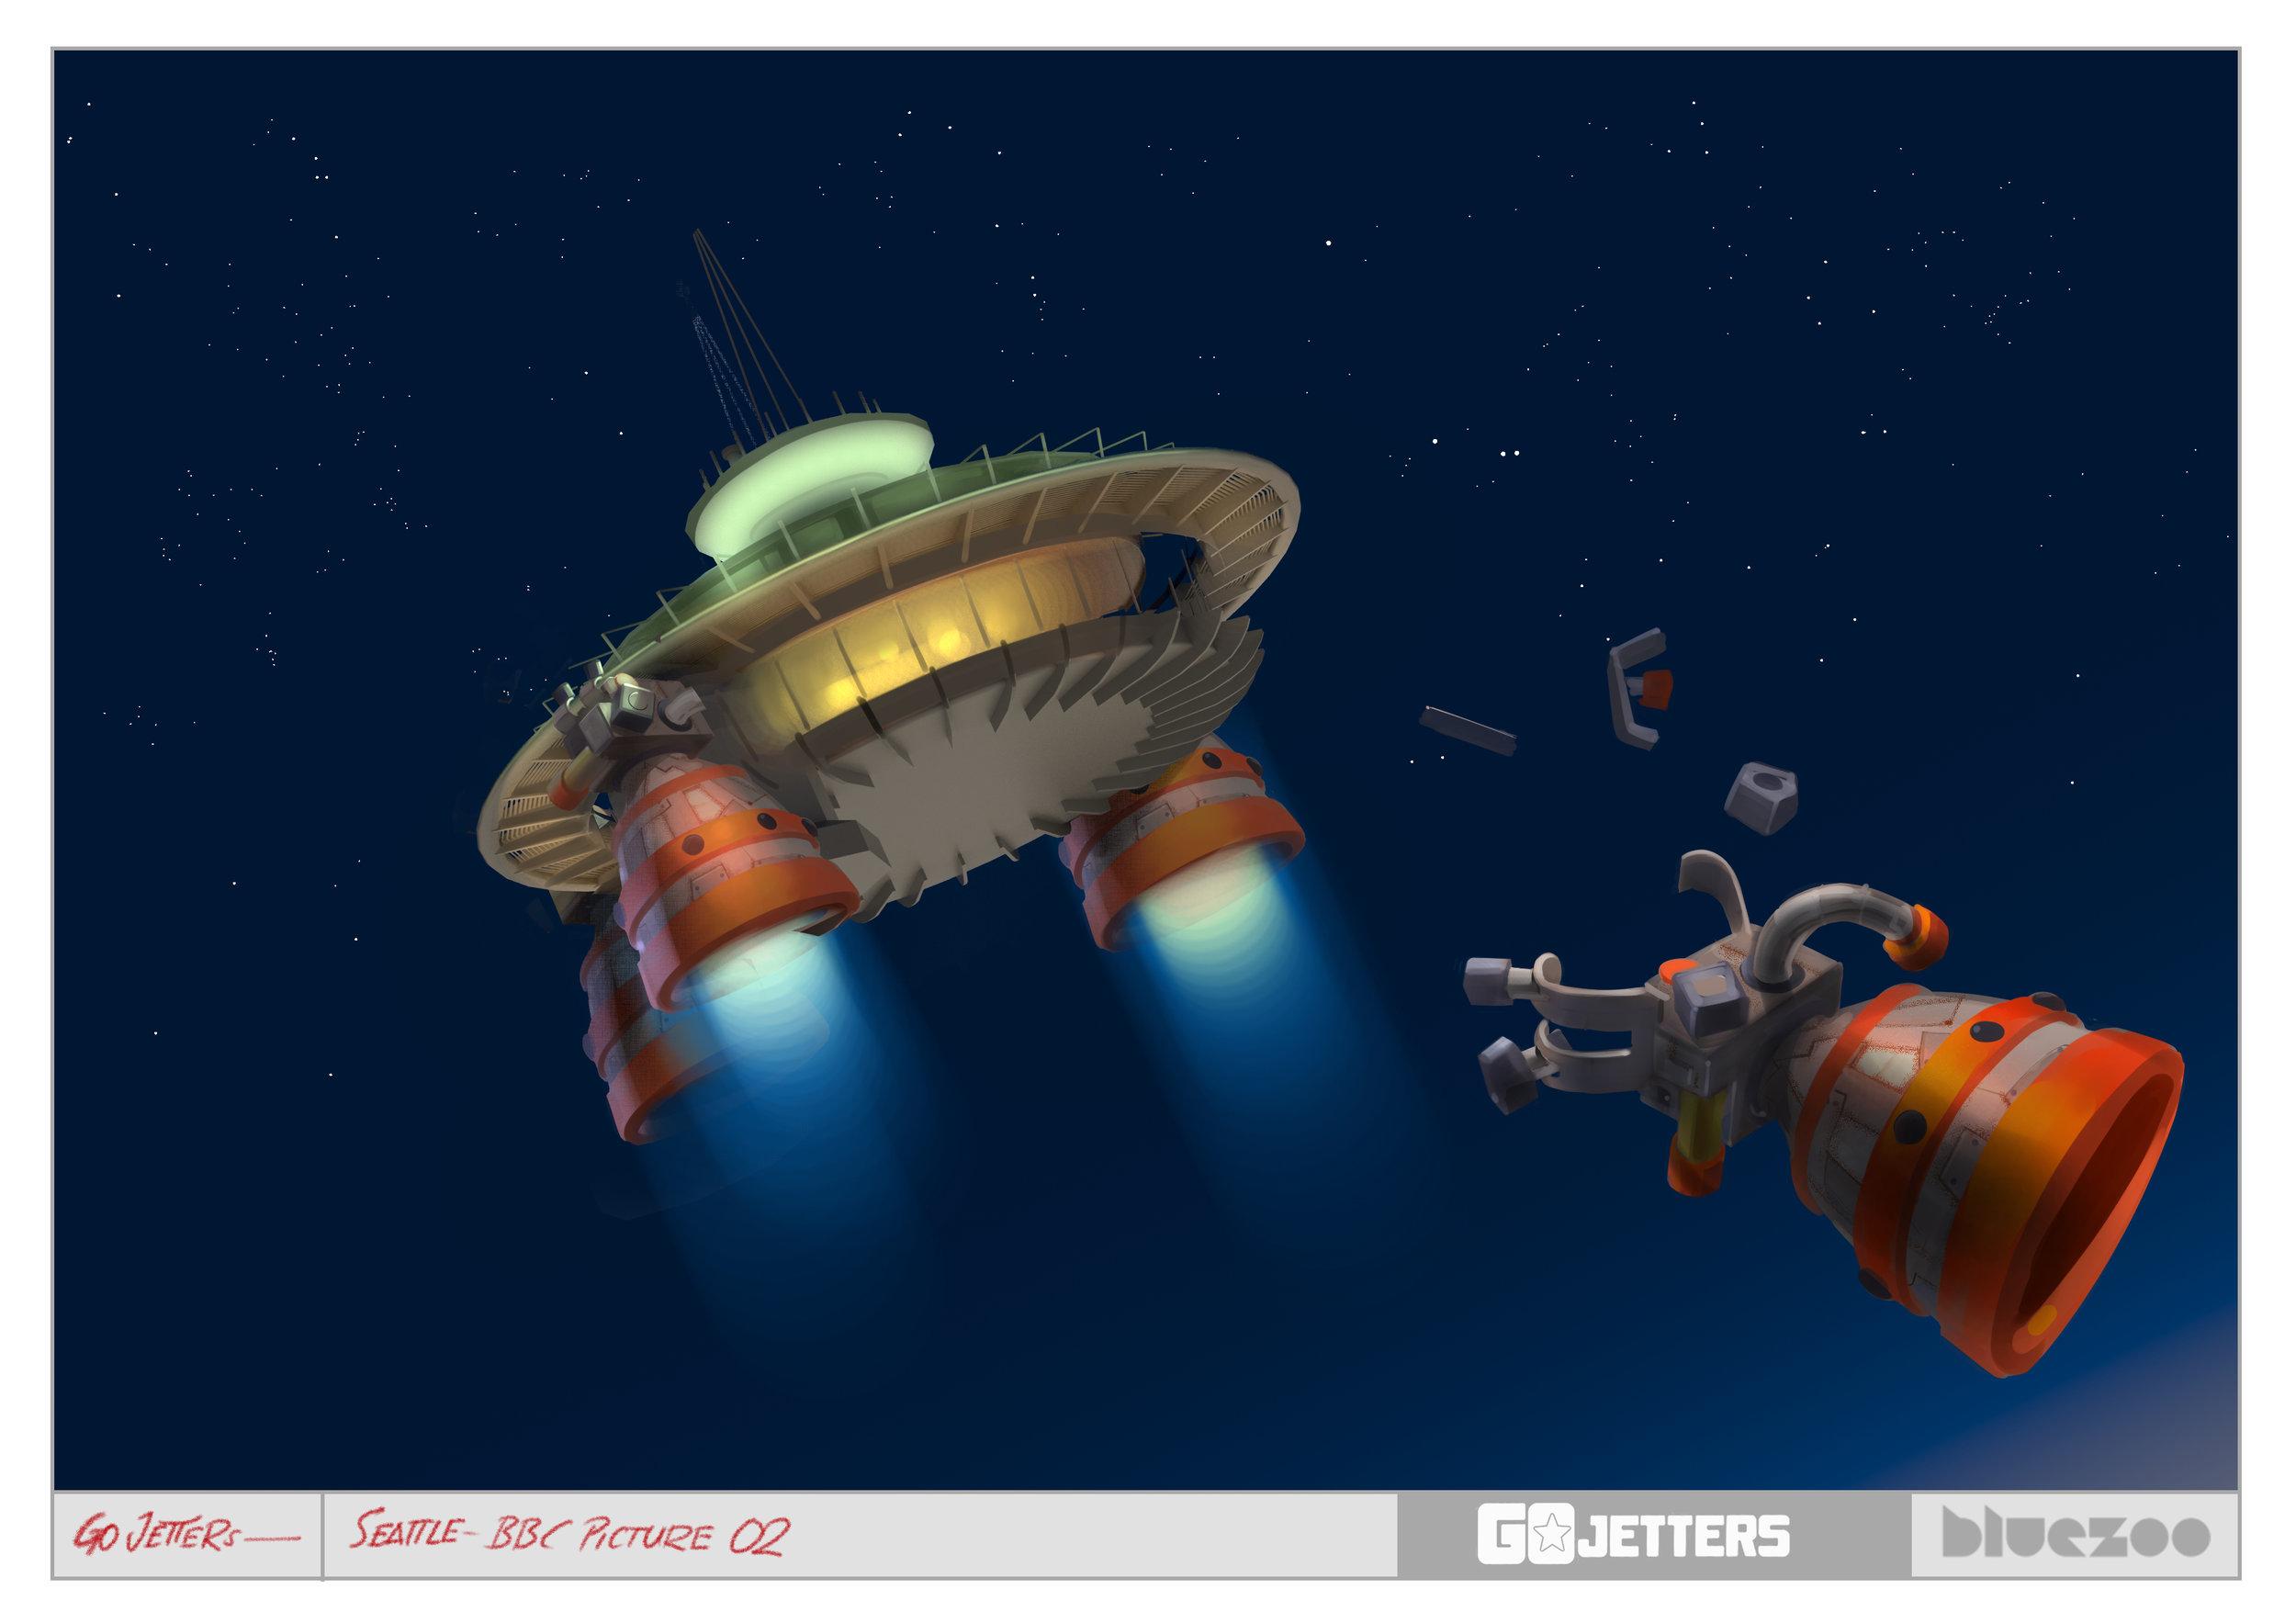 SpaceNeedle_BBCPicture_02.jpg